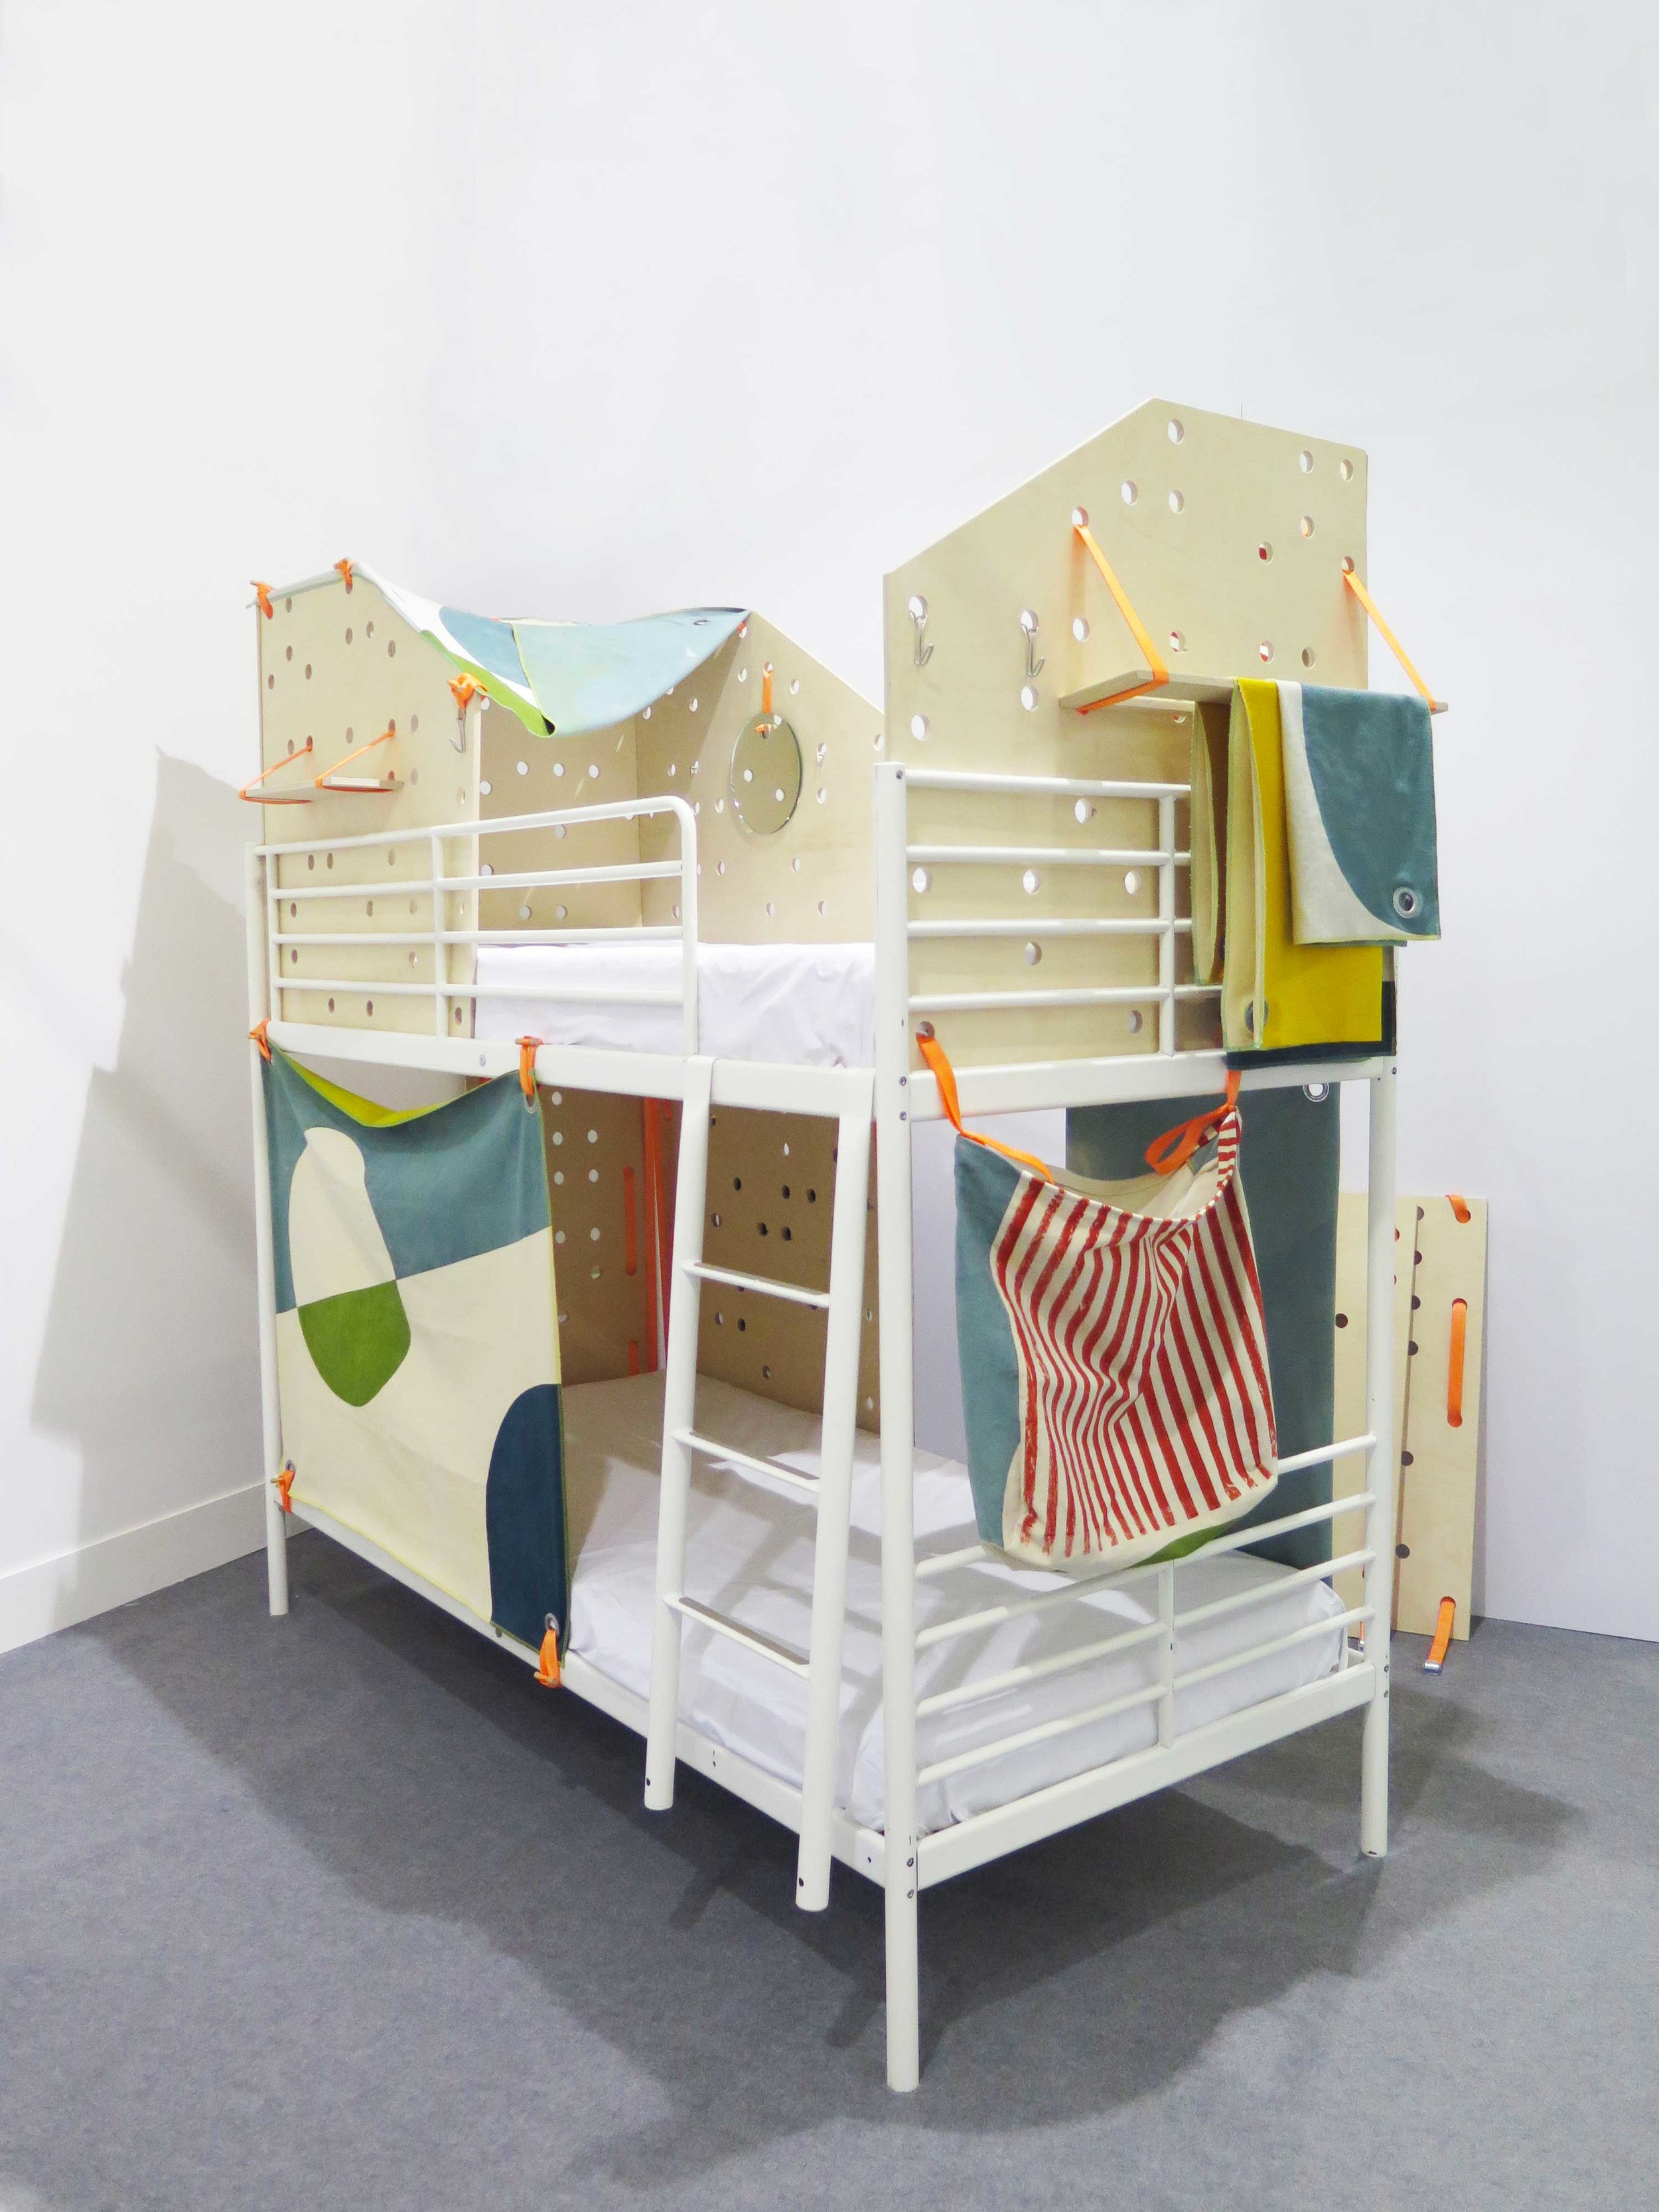 Janina Peter & David Williner - Social Design